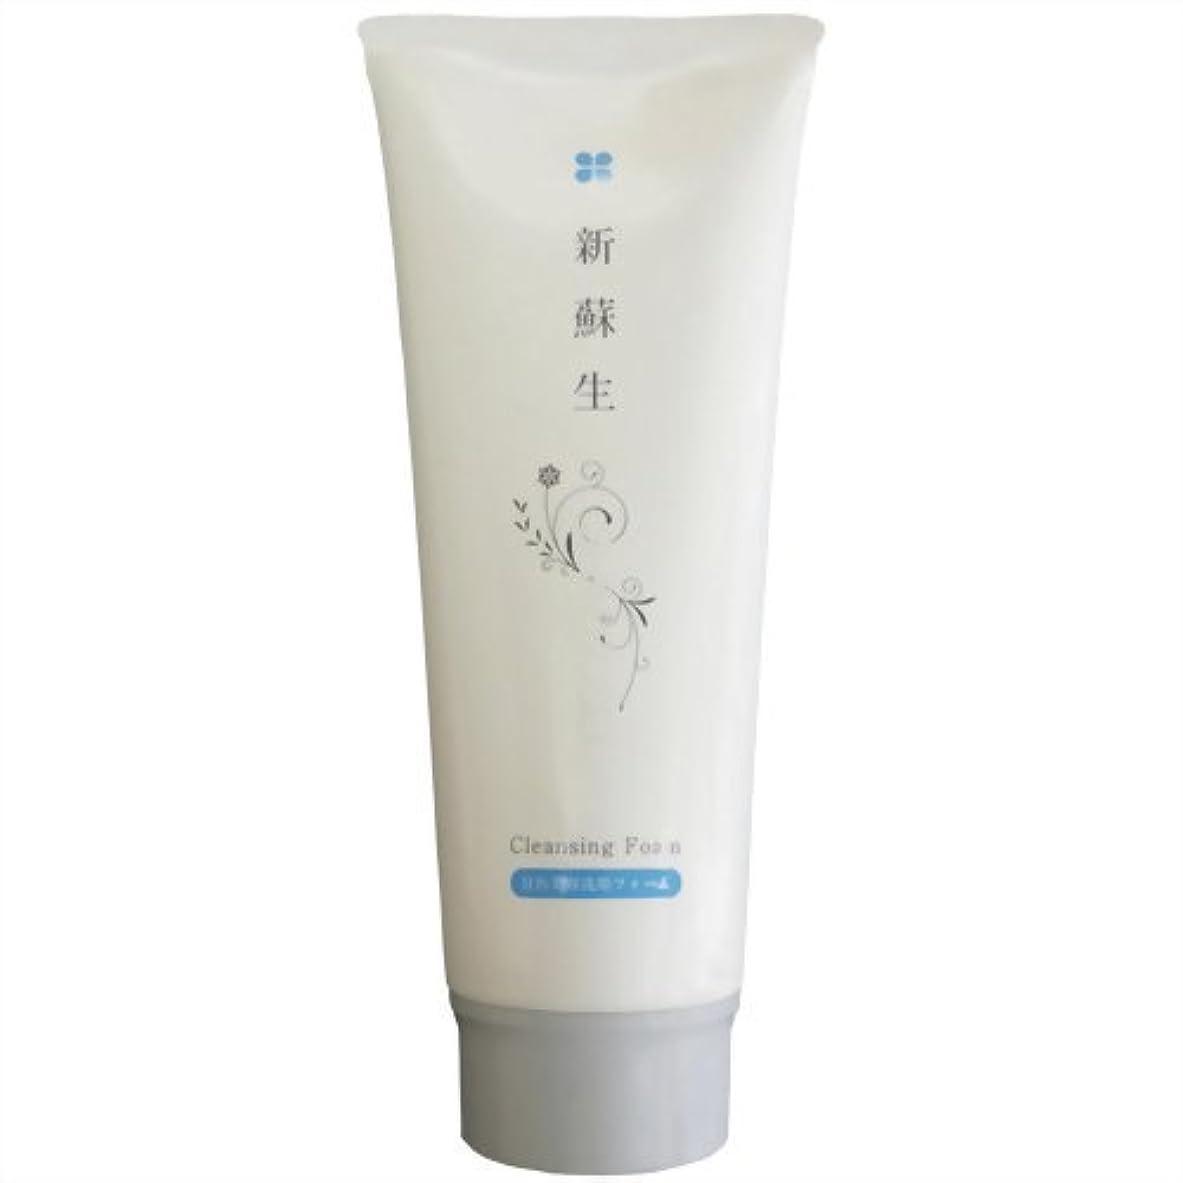 要件歌う貫通新蘇生 日医美容洗顔フォーム 120g